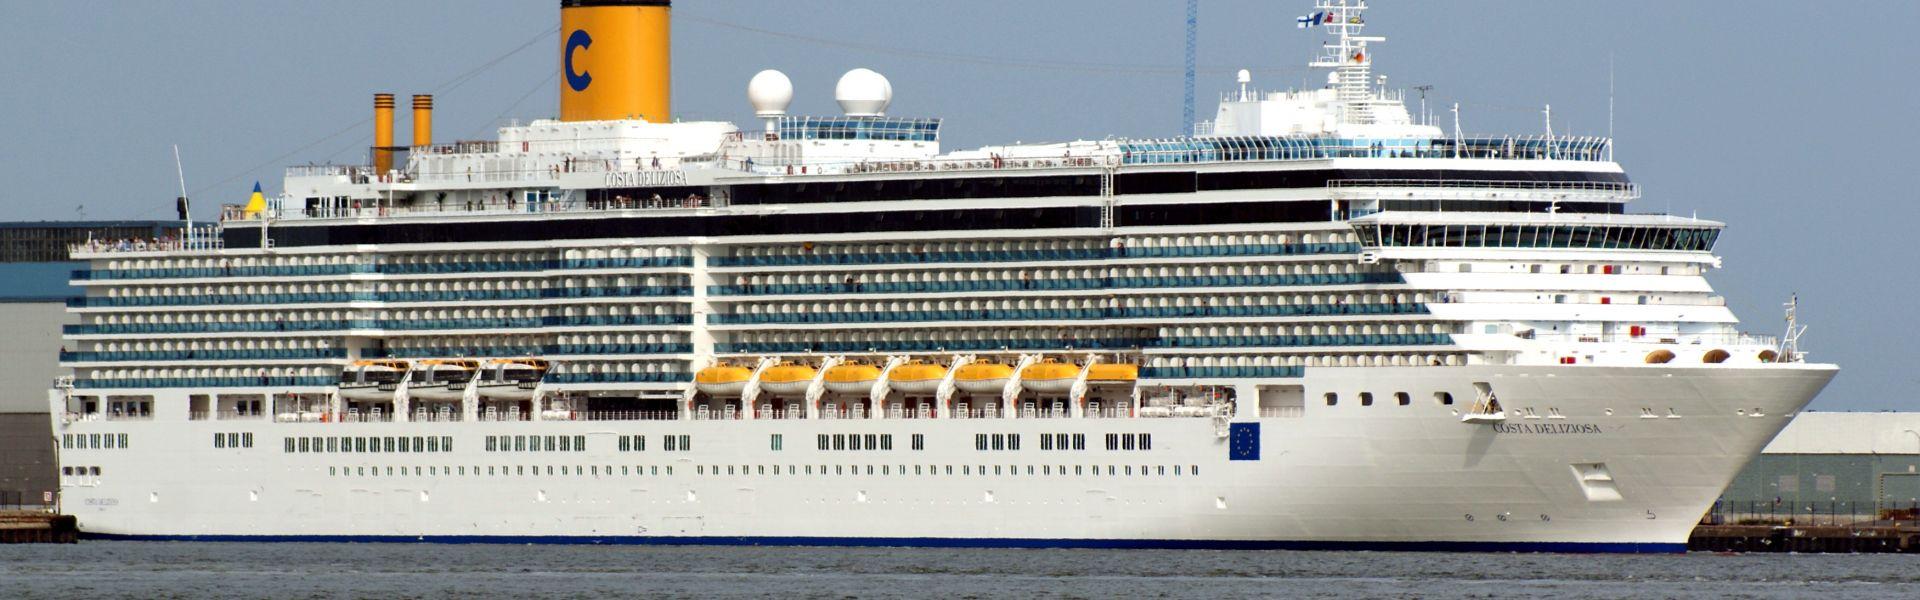 Croaziera 2018 - Mediterana de Est (Venetia) - Costa Cruises - Costa Deliziosa - 7 nopti